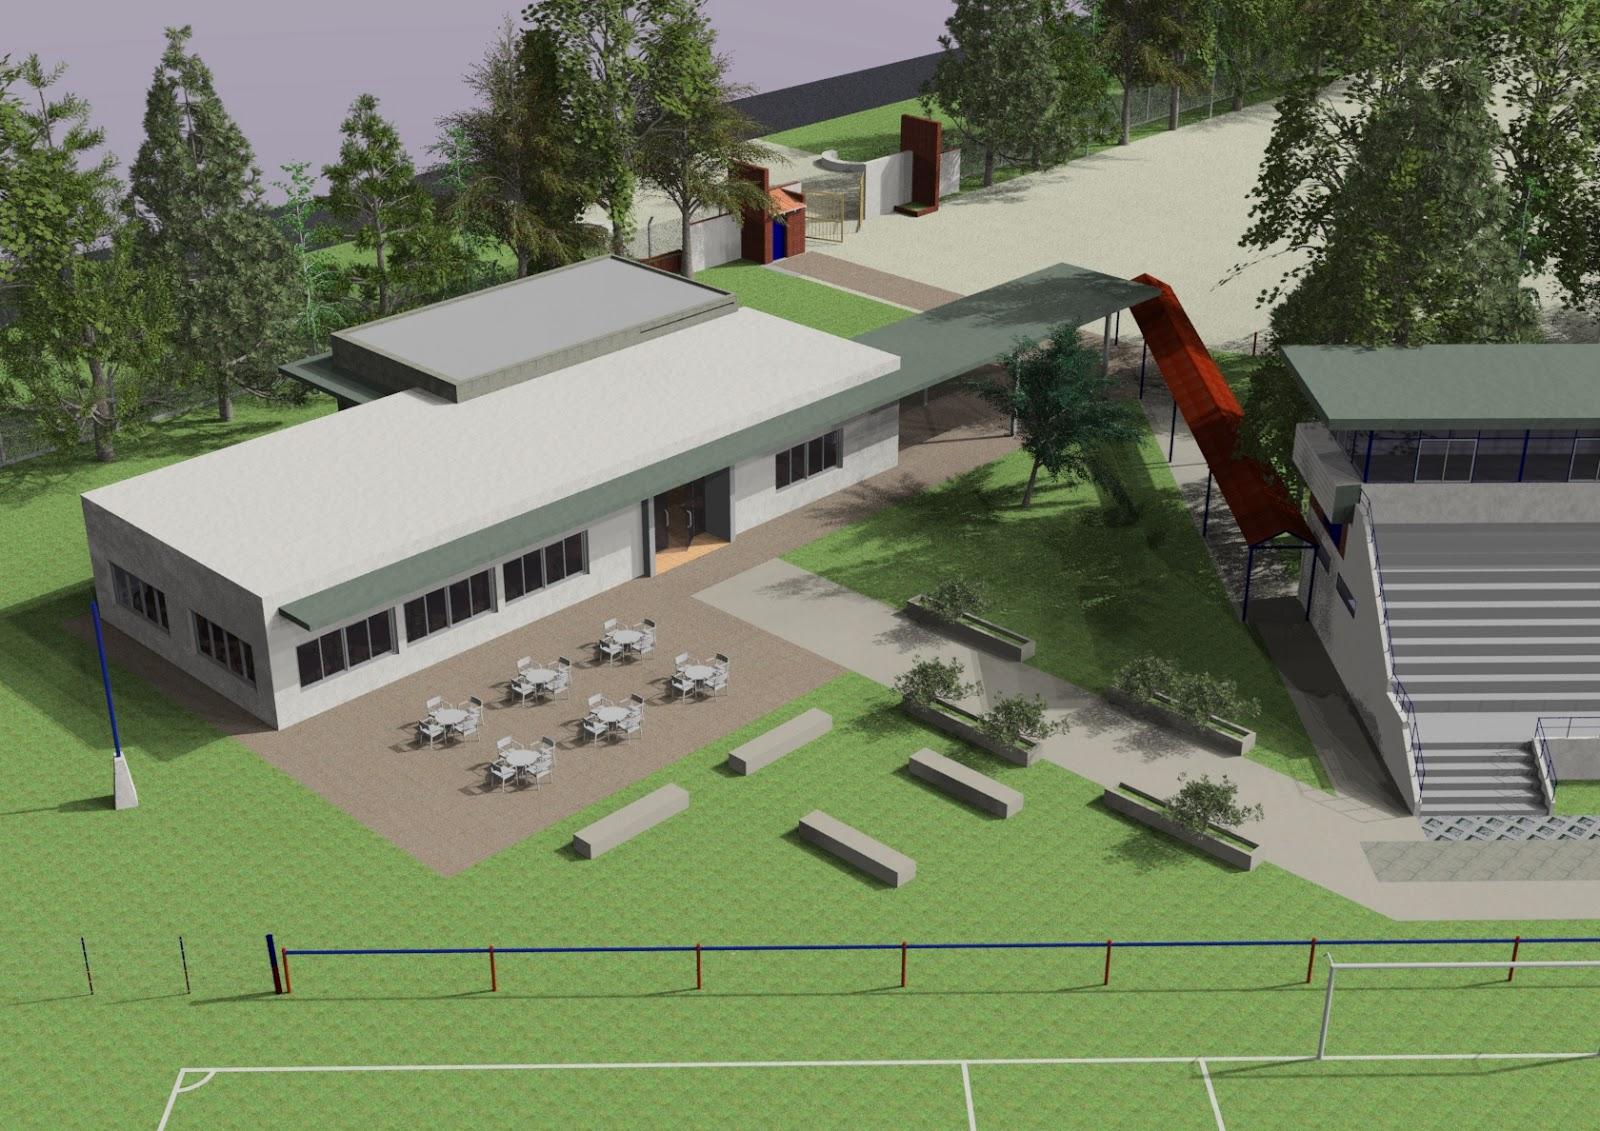 Av arquitectura anteproyecto para comedor estudiantil en for Comedor estudiantil